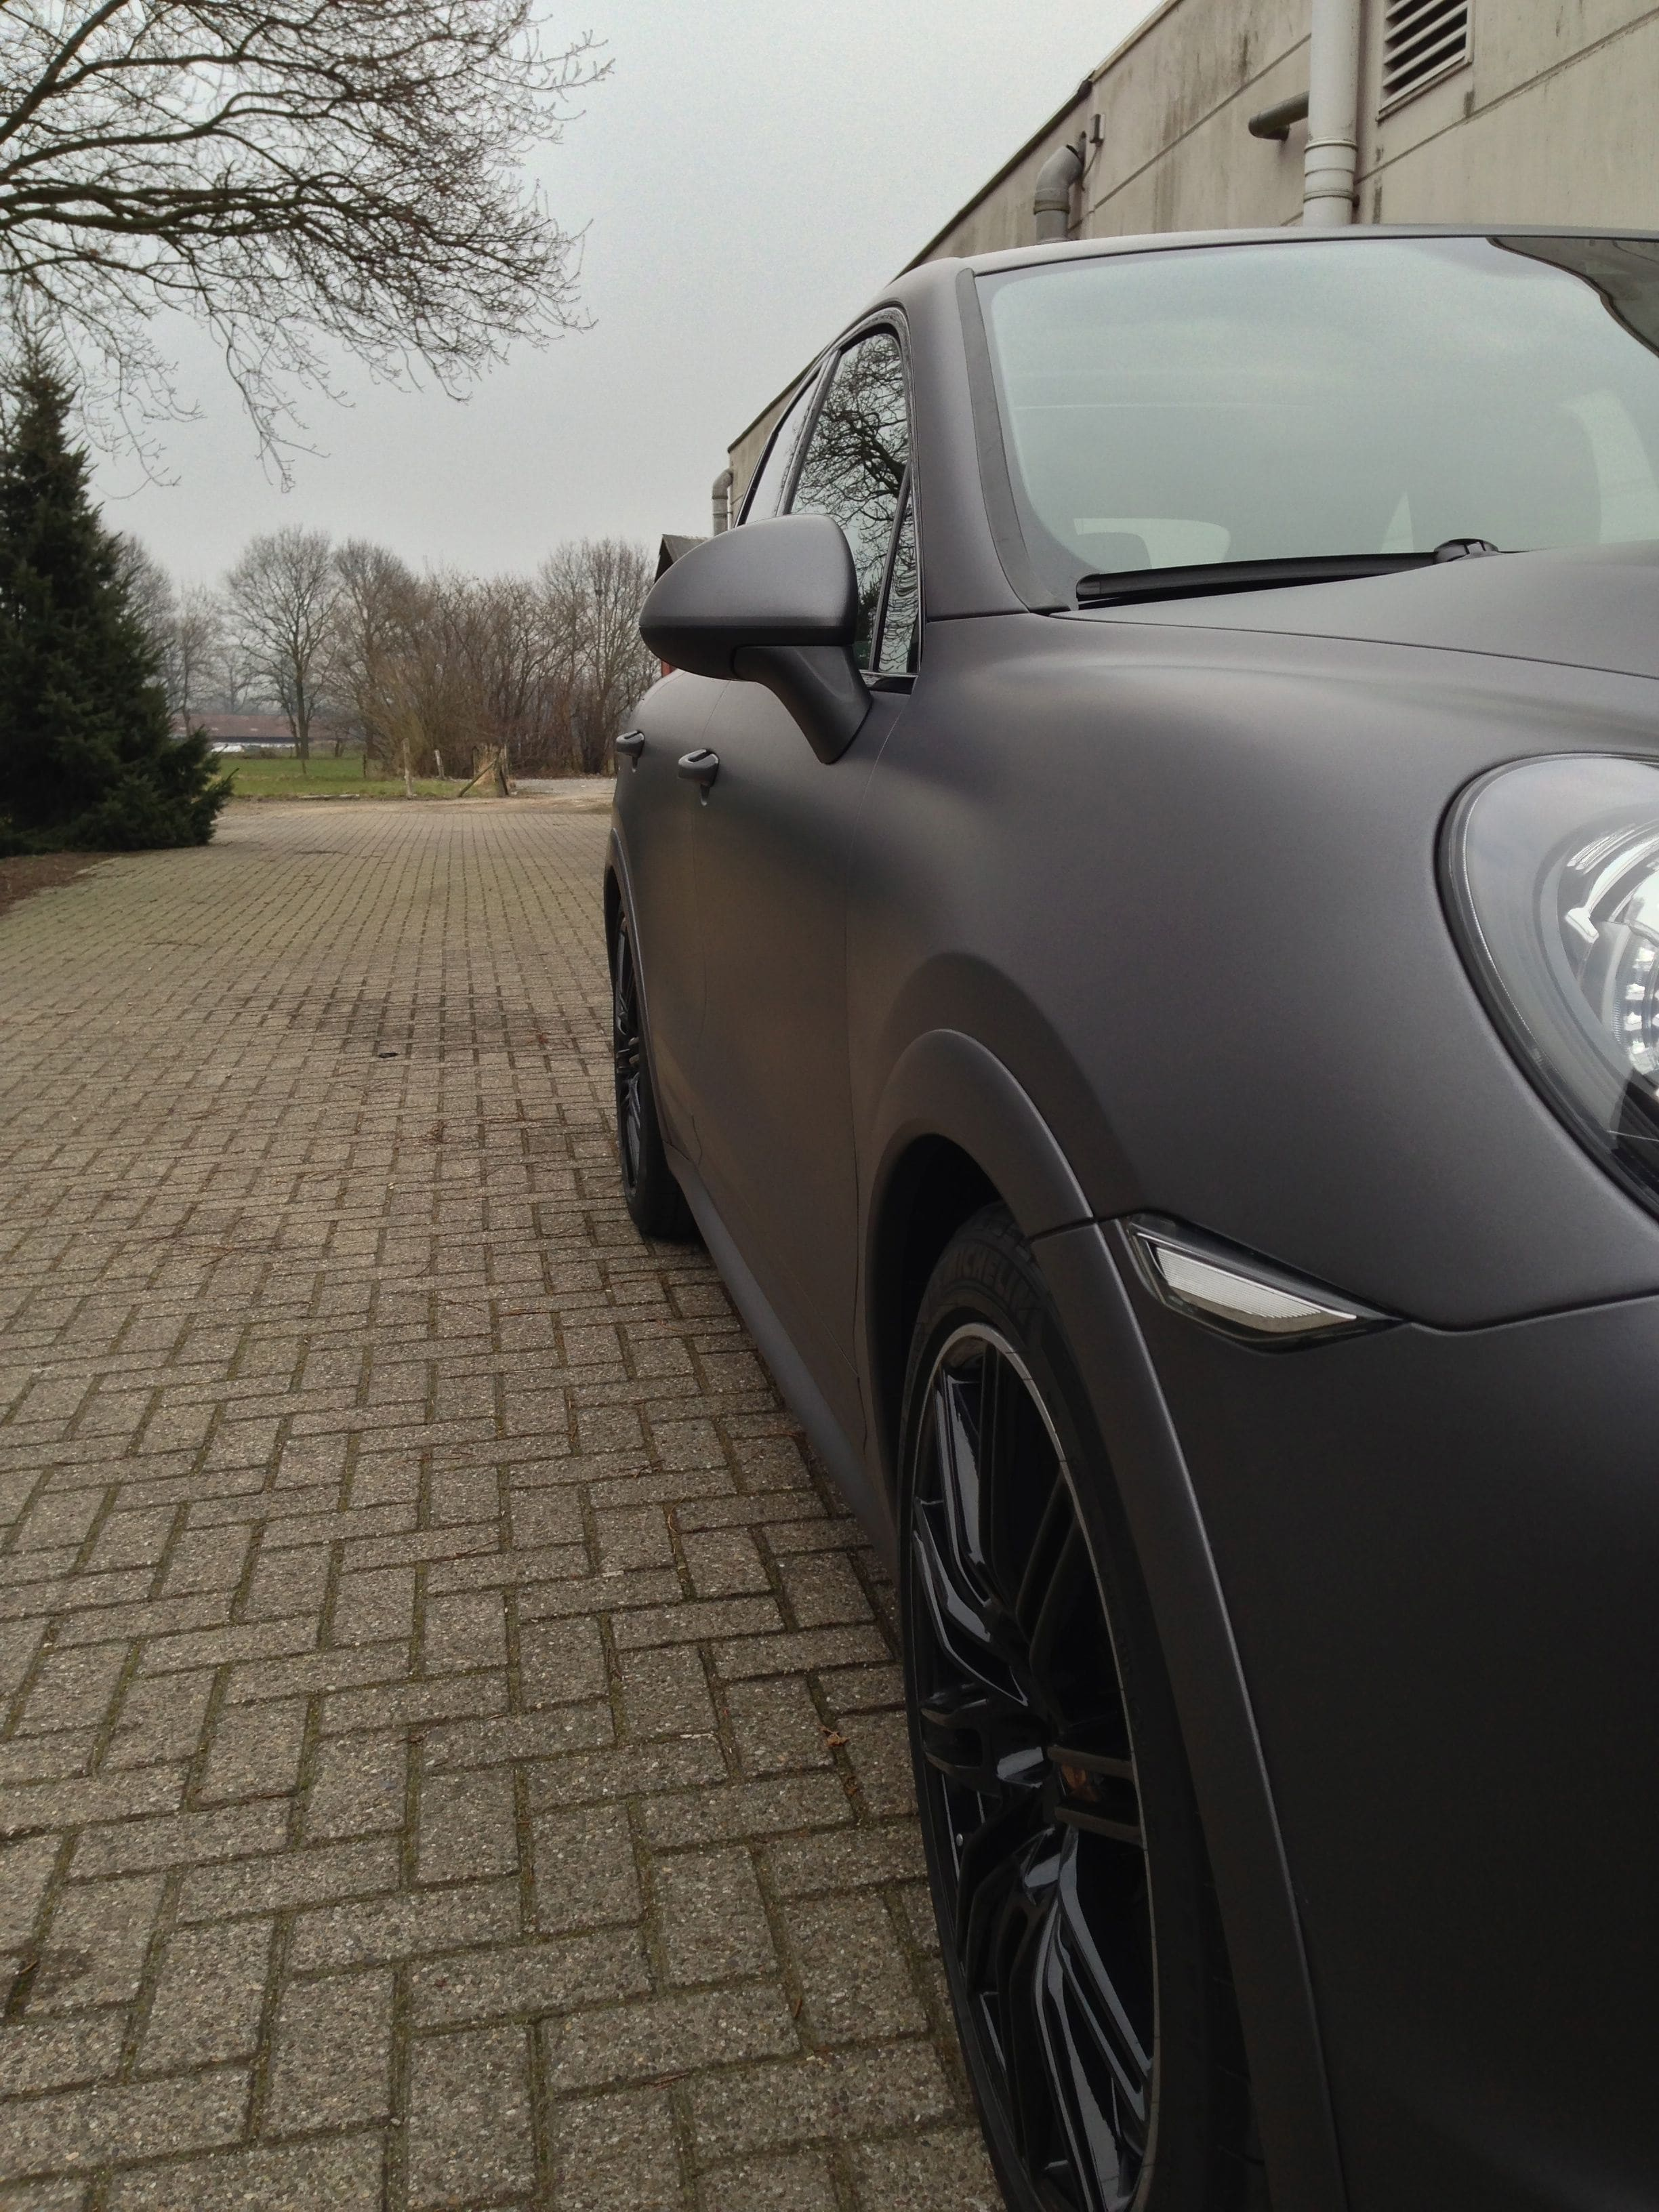 Porsche Cayenne GTS met Gunpowder Wrap, Carwrapping door Wrapmyride.nu Foto-nr:6772, ©2021